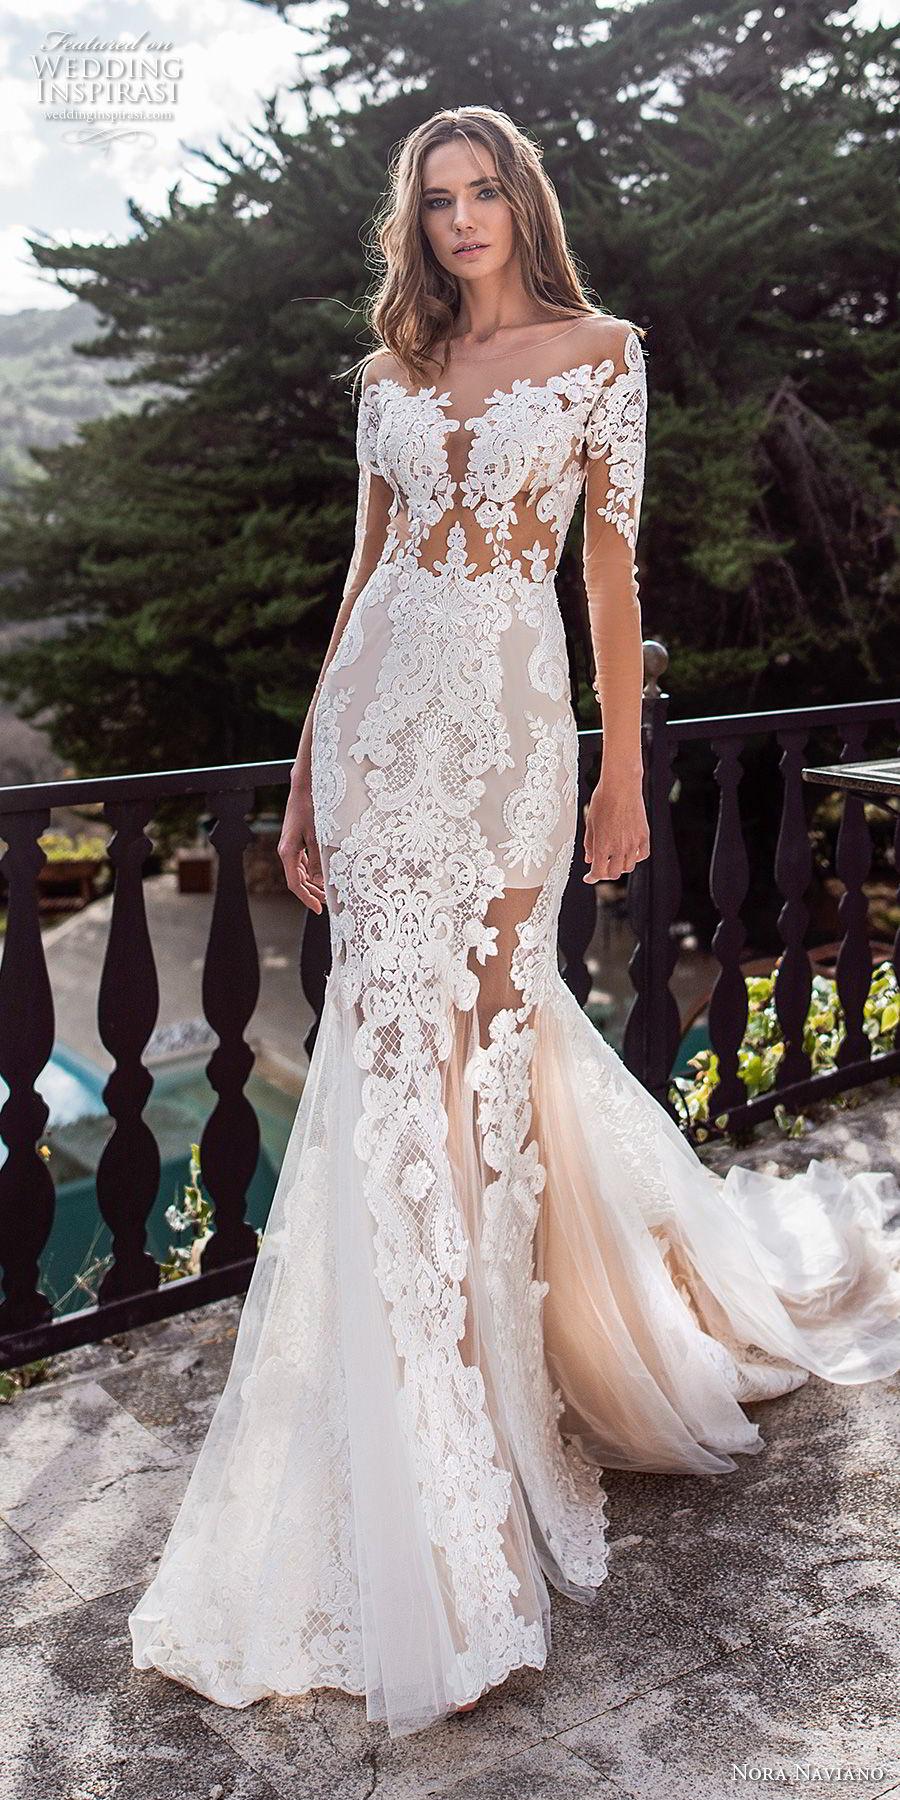 Nora Naviano 2019 Wedding Dresses Voyage Bridal